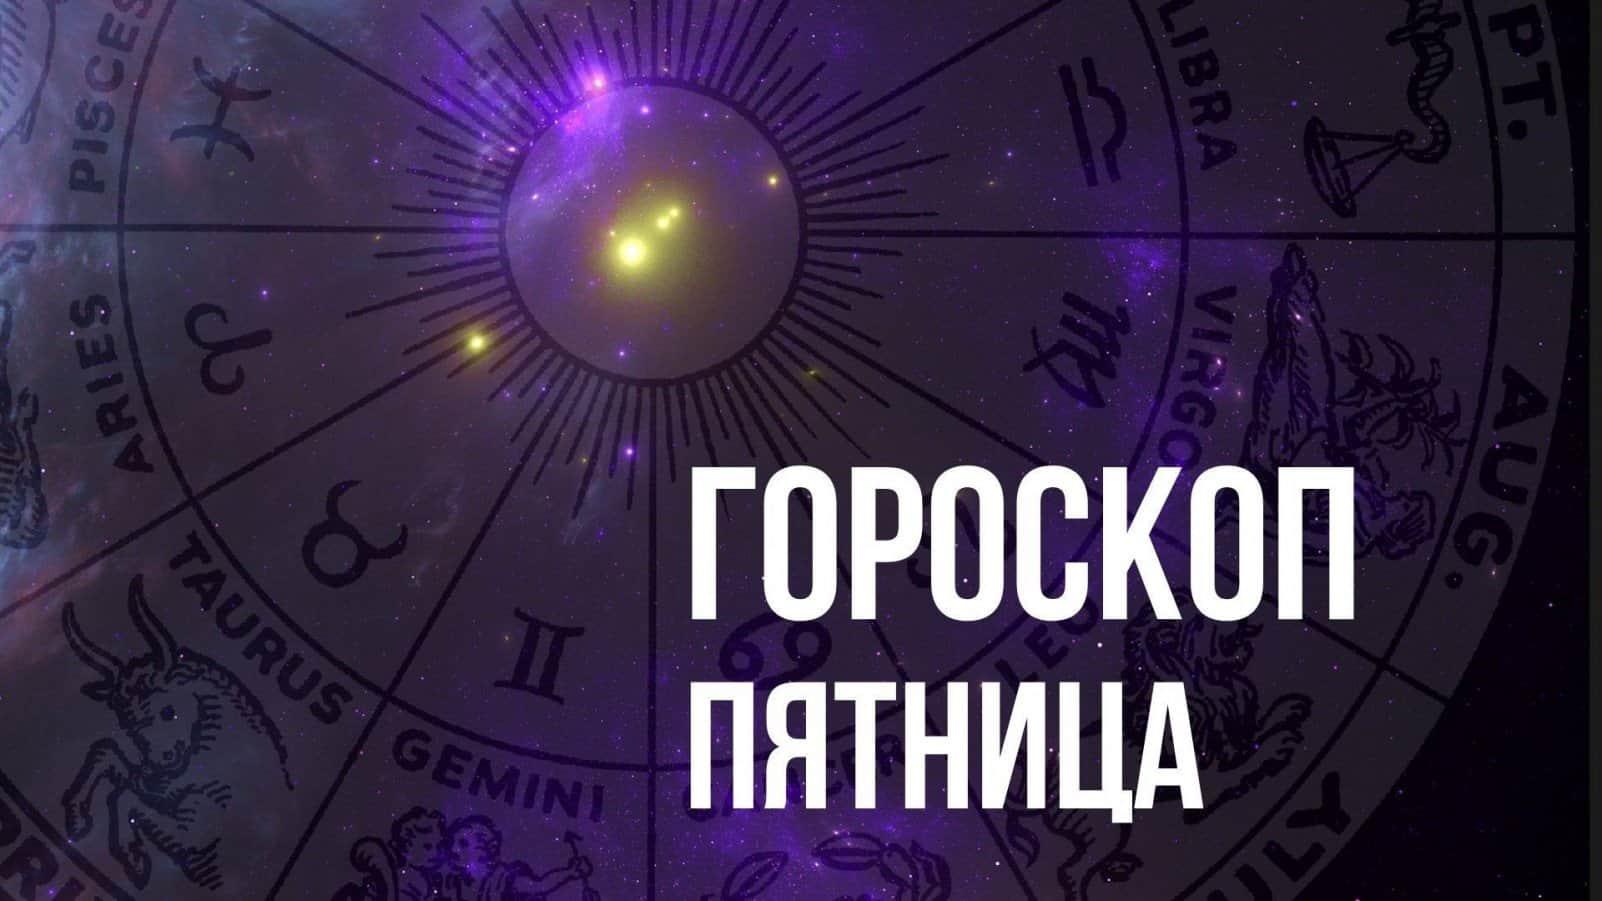 Гороскоп на пятницу 12 марта для каждого знака Зодиака